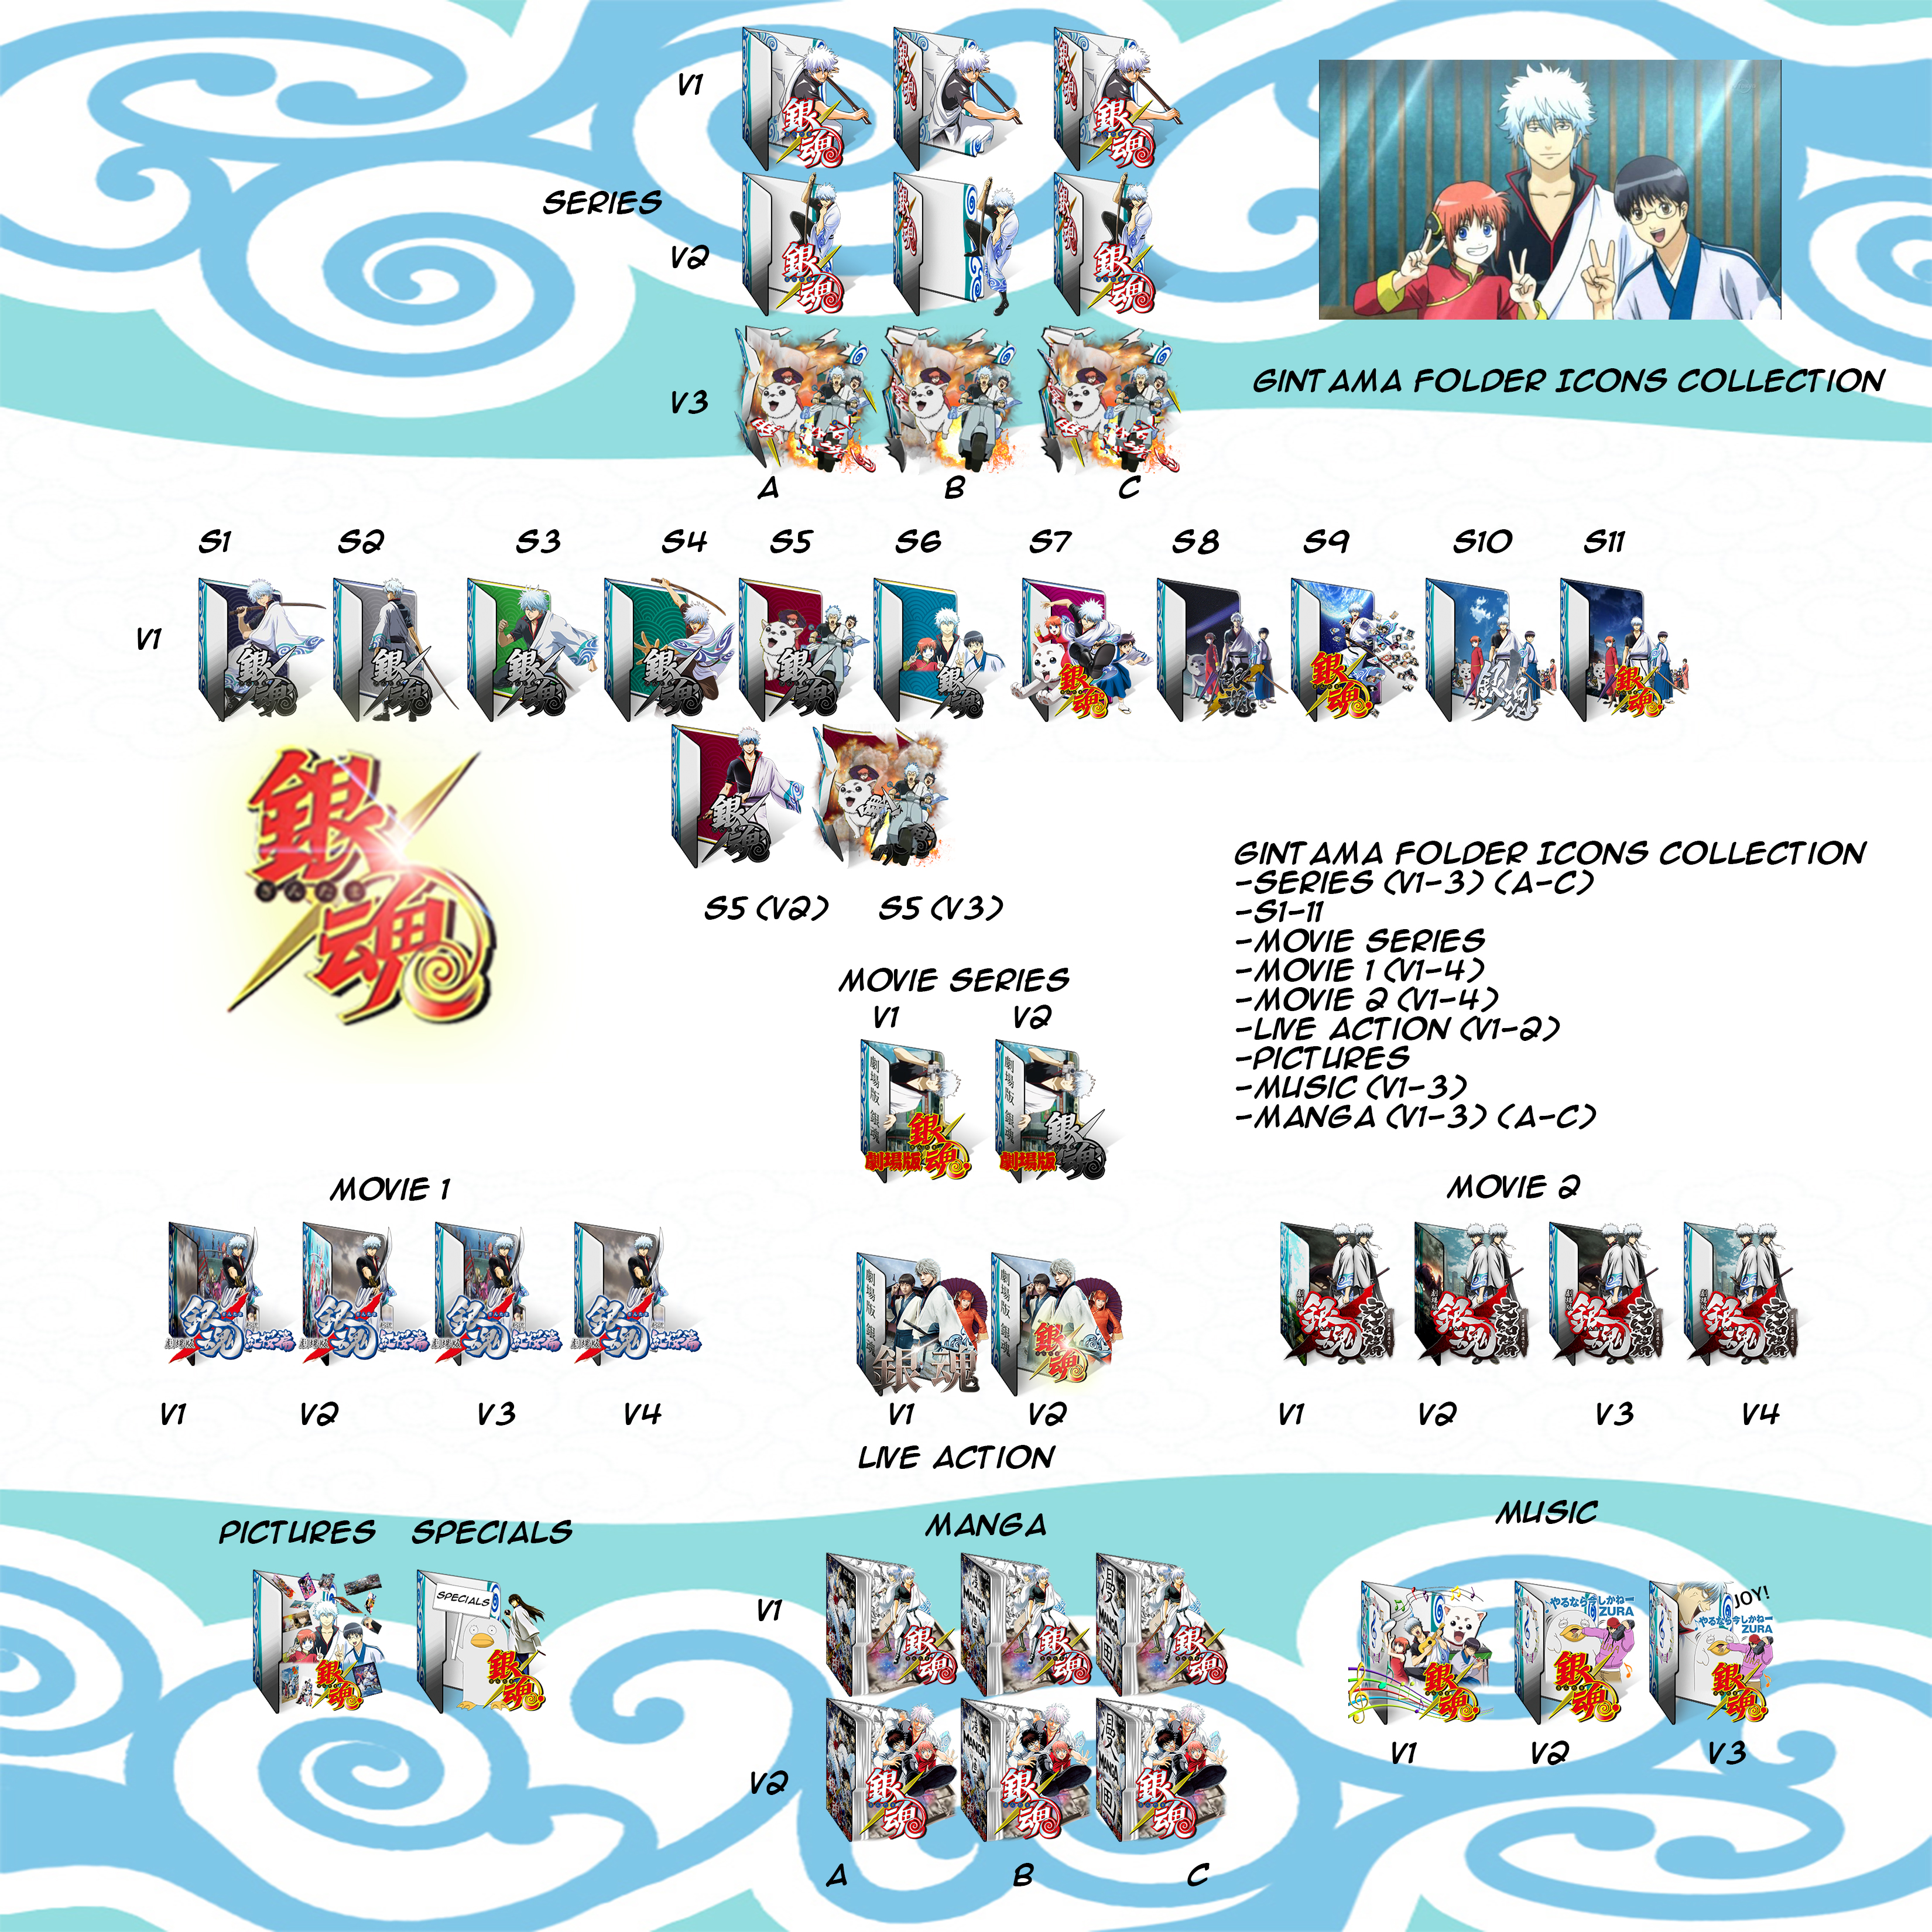 Gintama Folder Icons Collection By Alexartchanimte7 On Deviantart